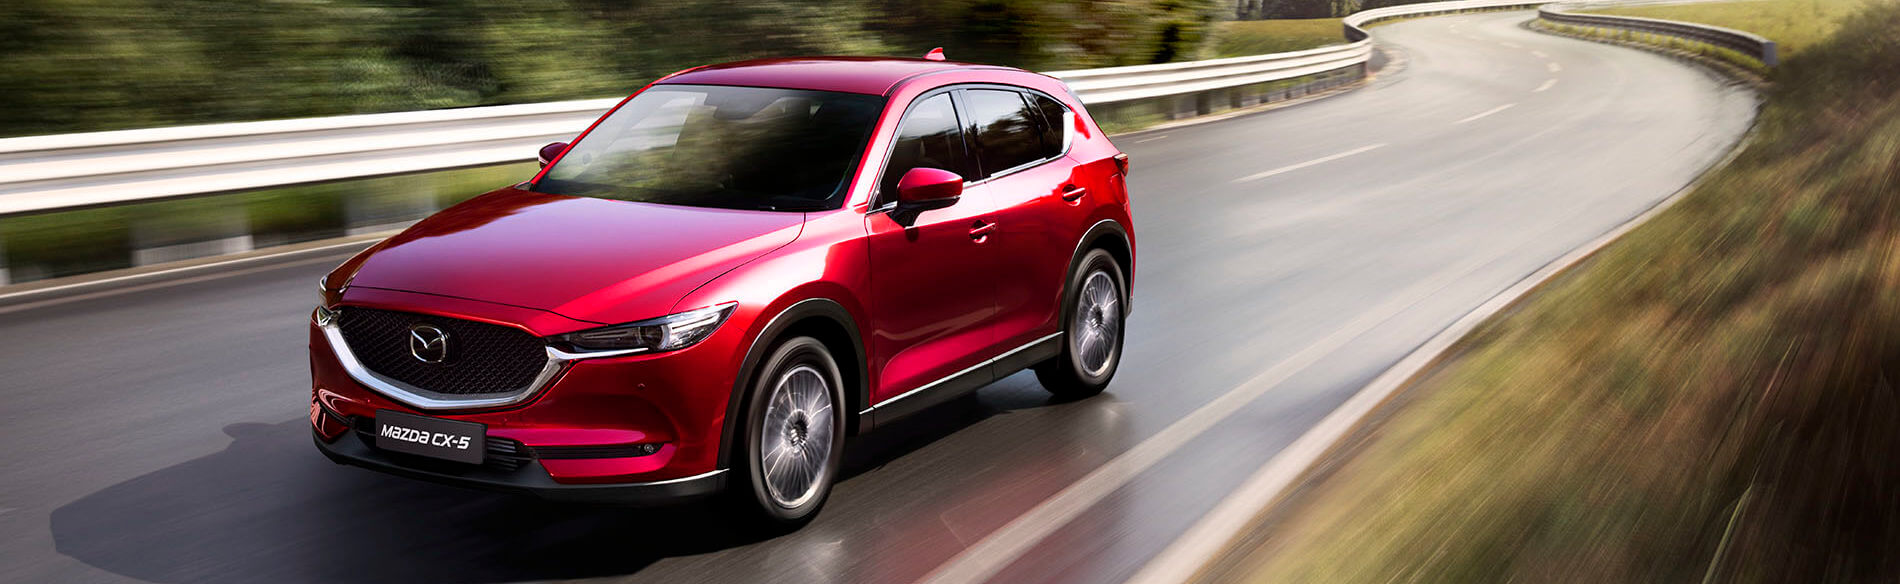 Mazda cx-5 exterior